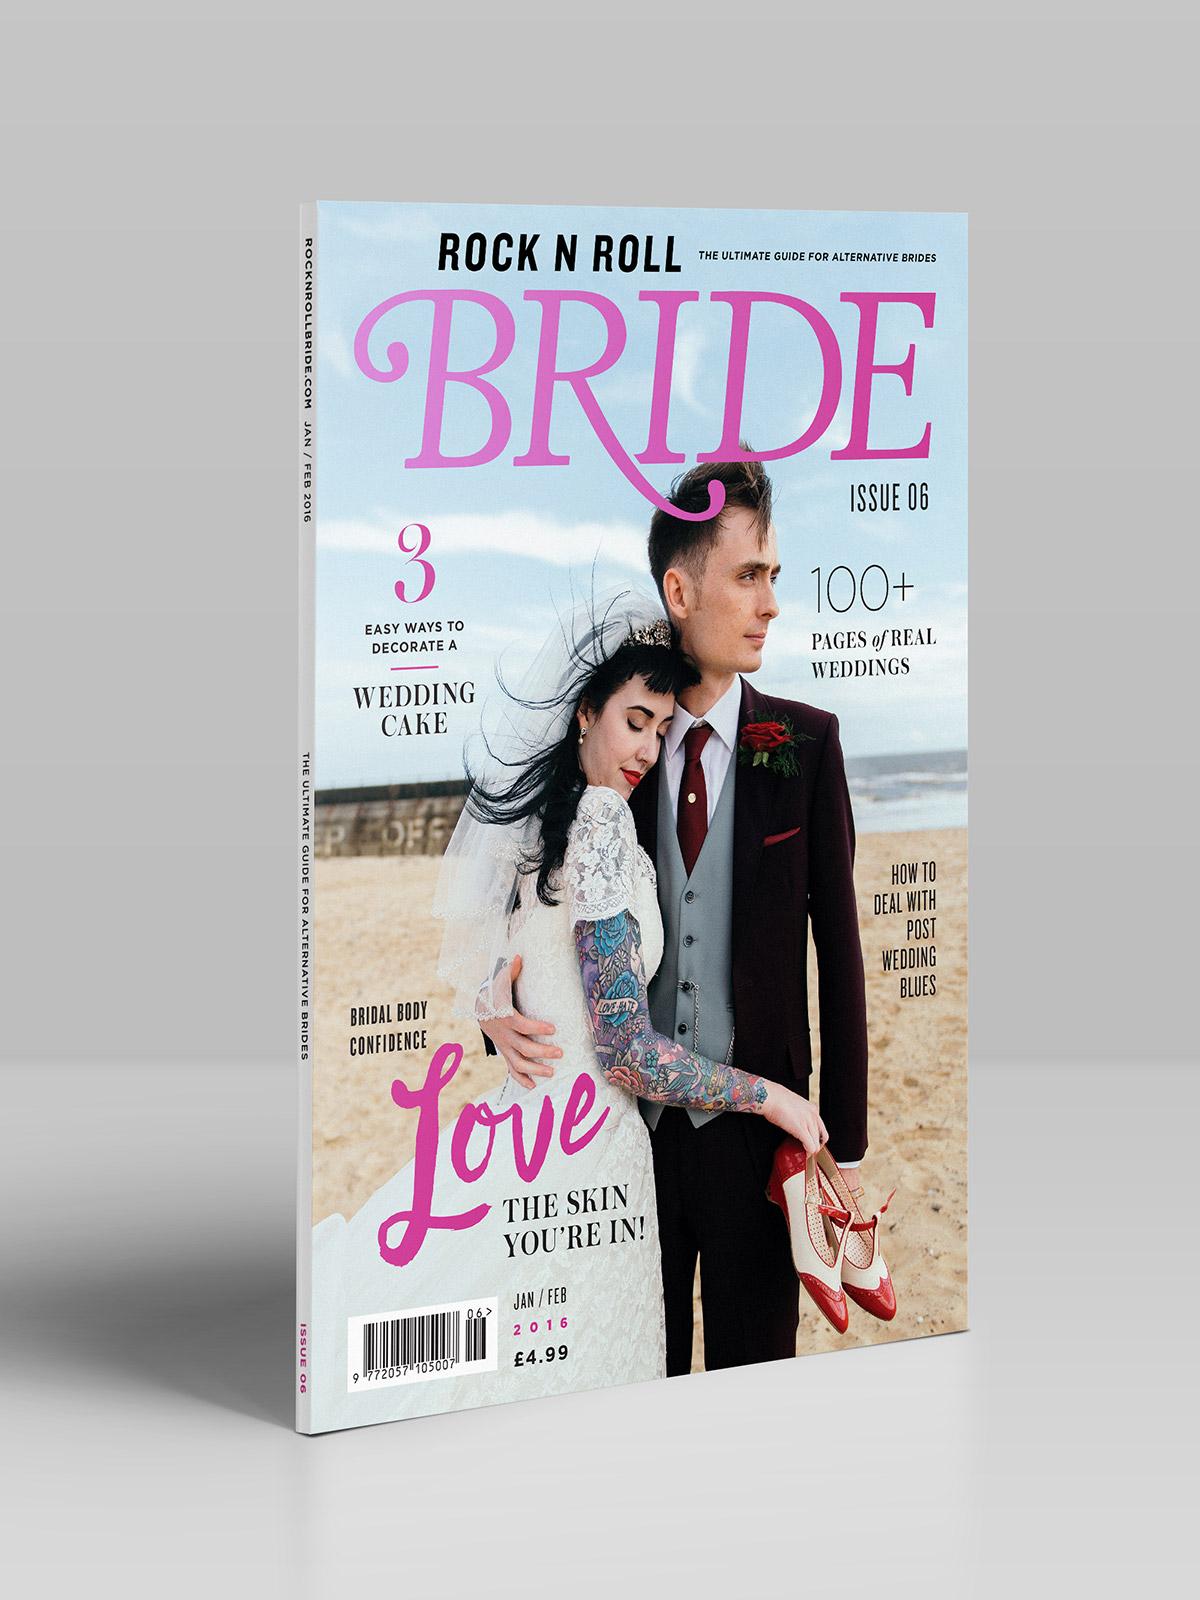 Branch | Rock n Roll bride Magazine Issue 6